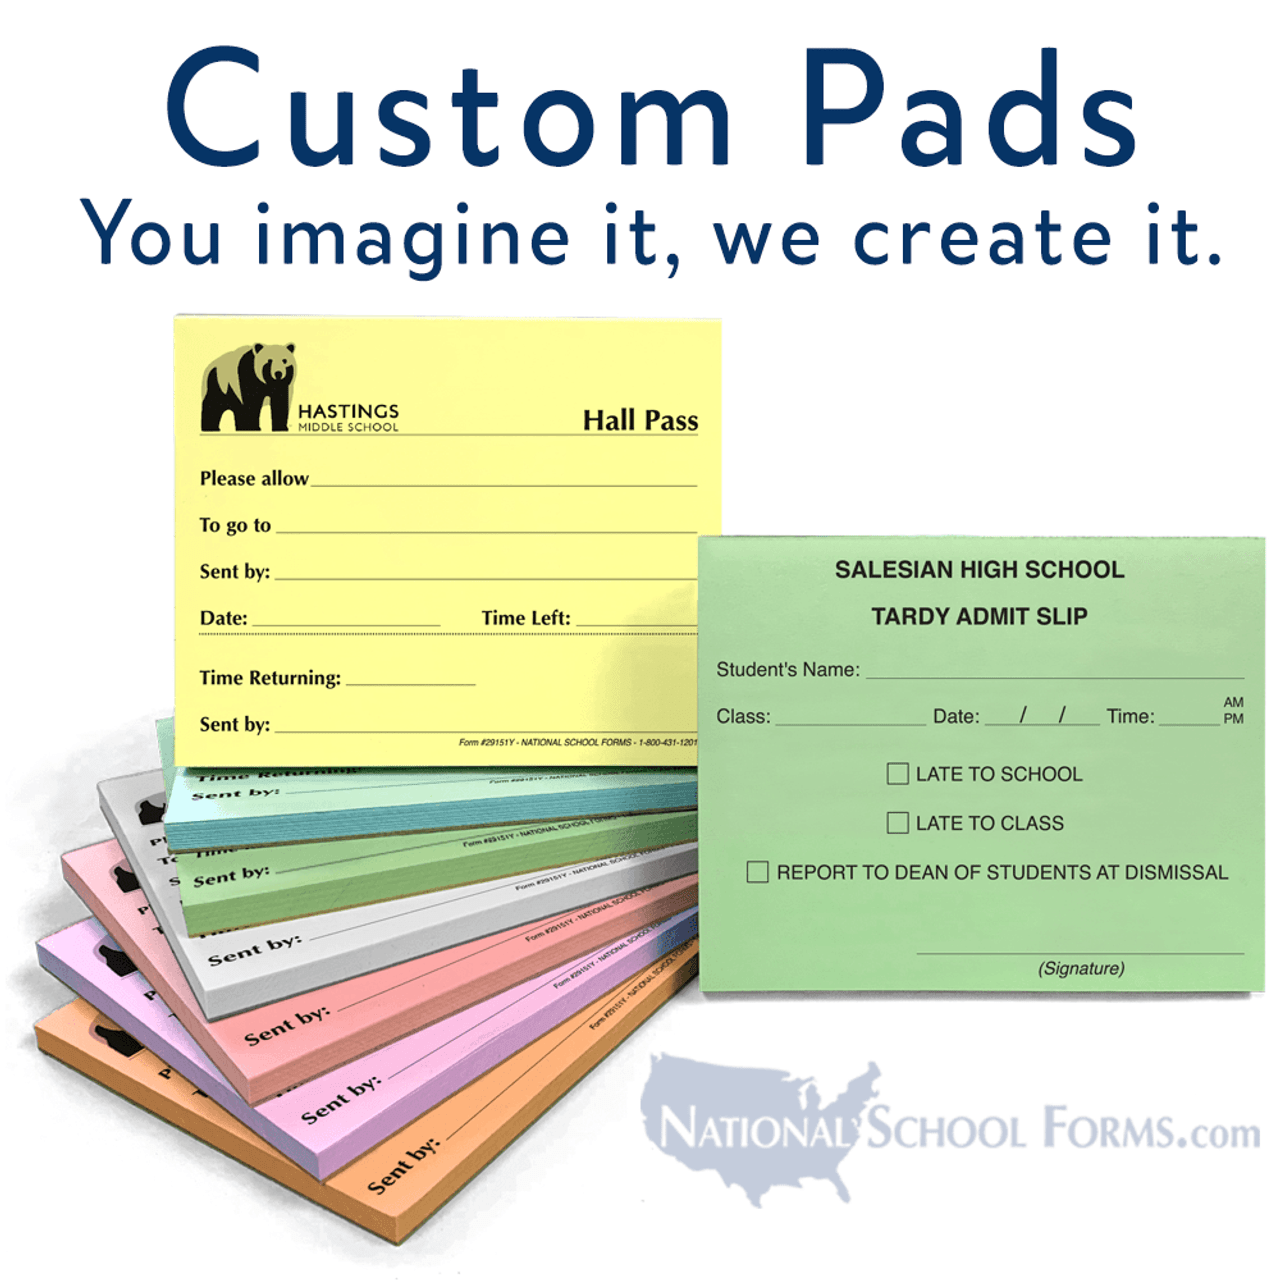 "Customized Pad - 4¼"" x 3½"" - 50 Sheets / Pad"